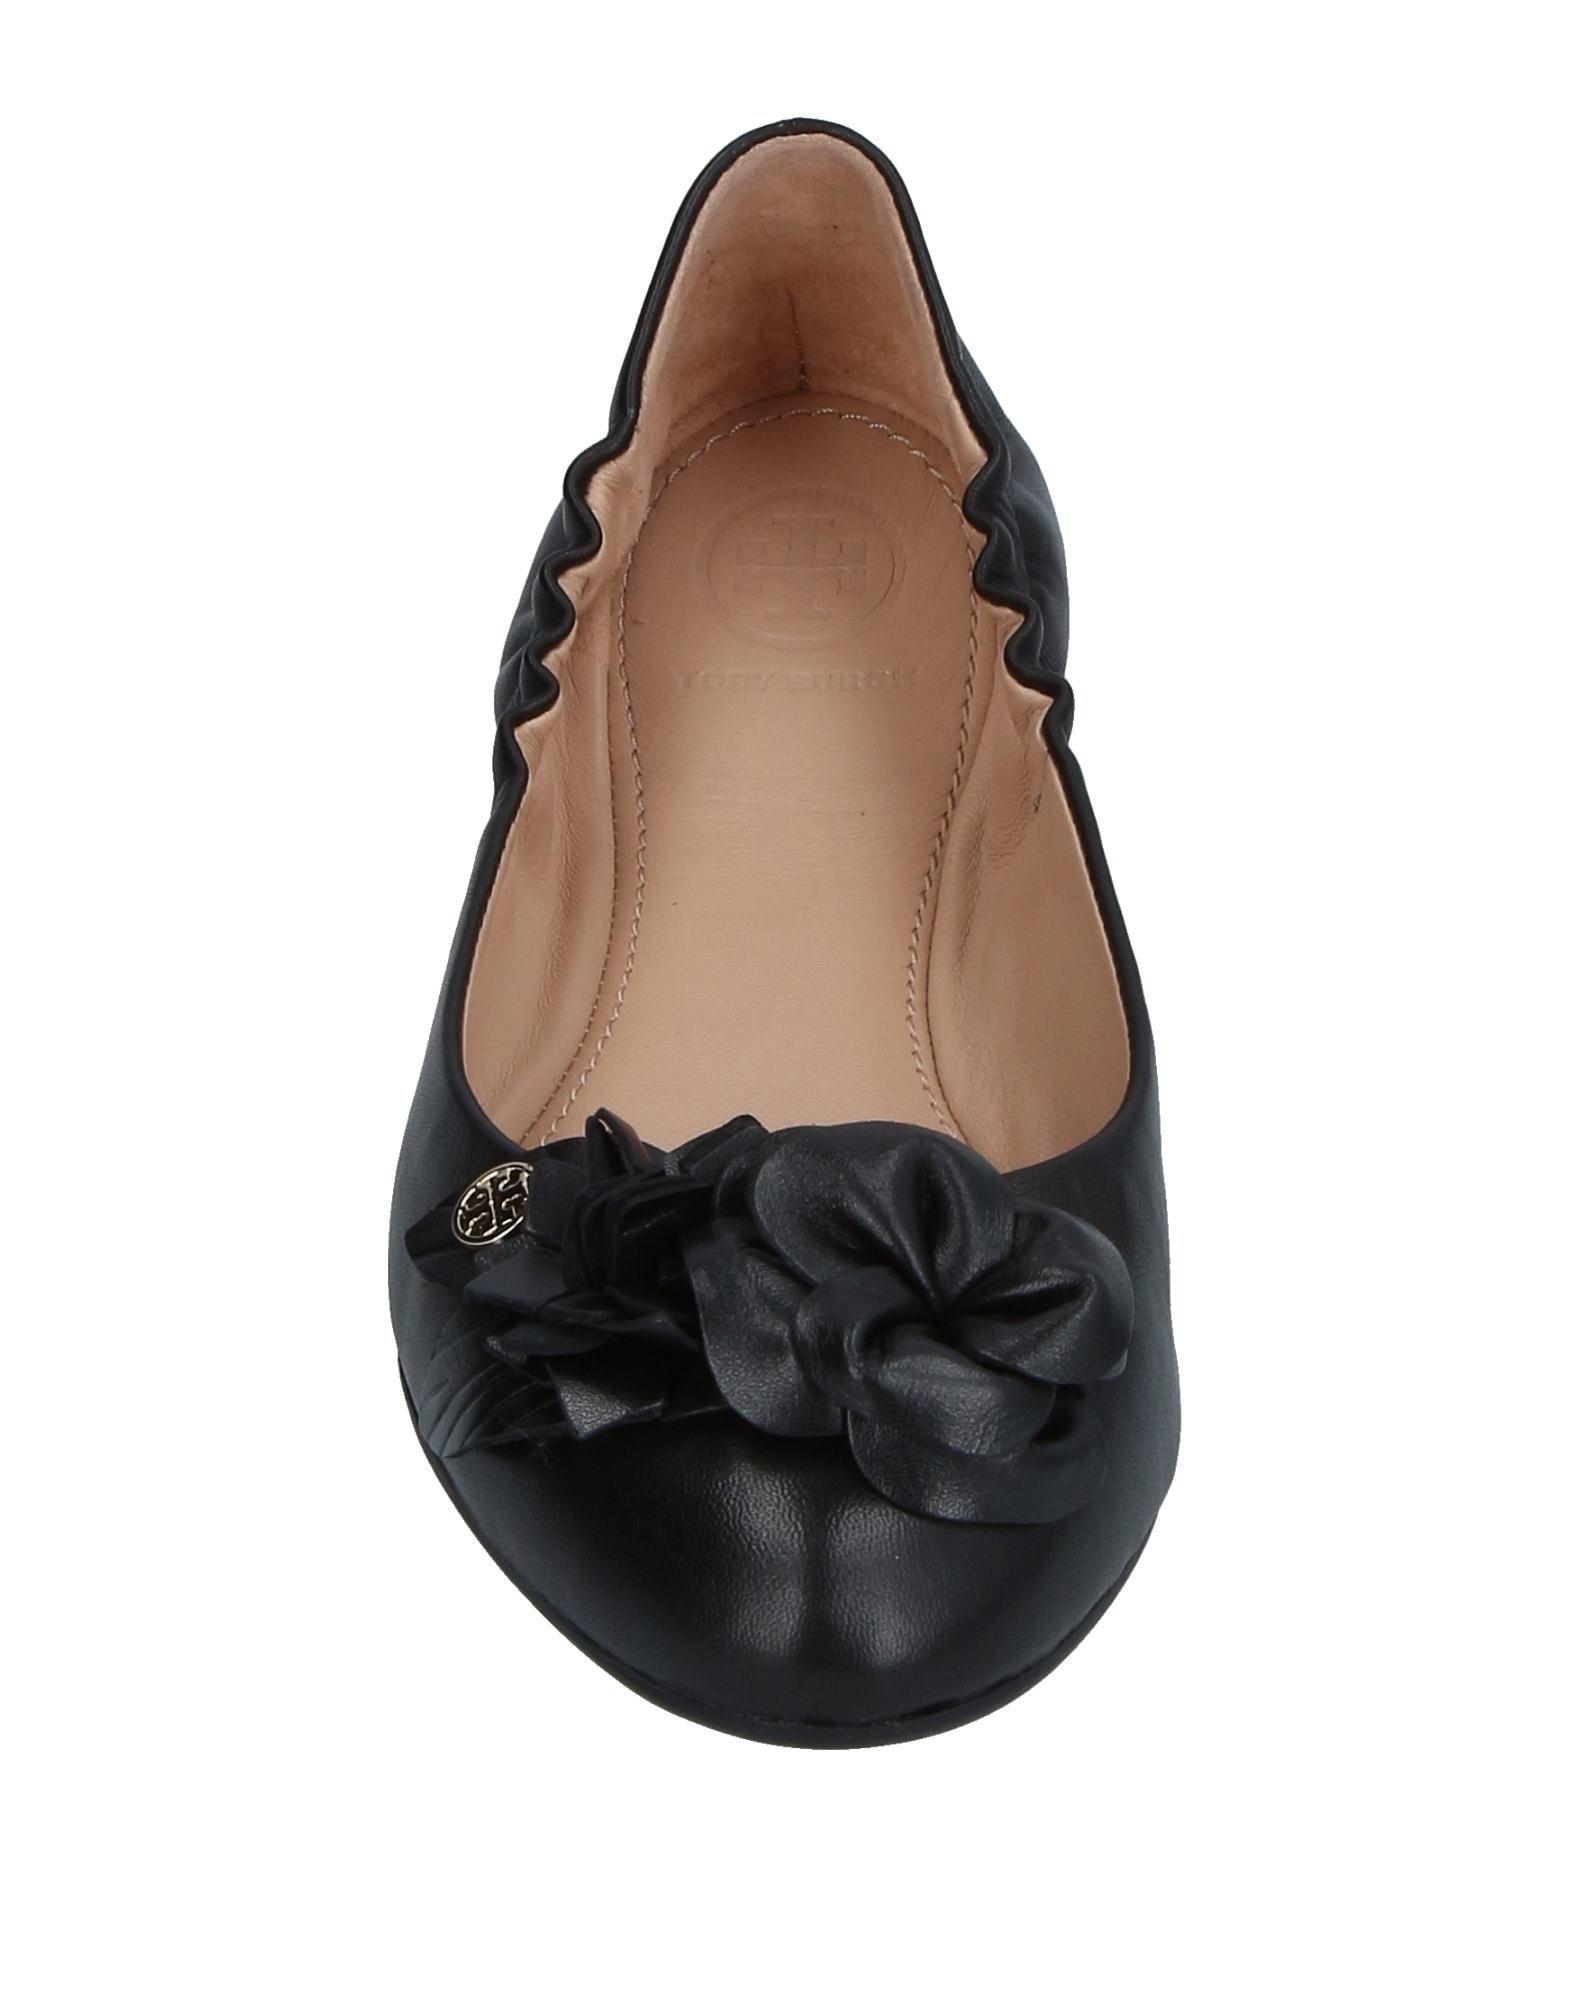 Tory 11219341TF Burch Ballerinas Damen  11219341TF Tory Neue Schuhe 454ef2